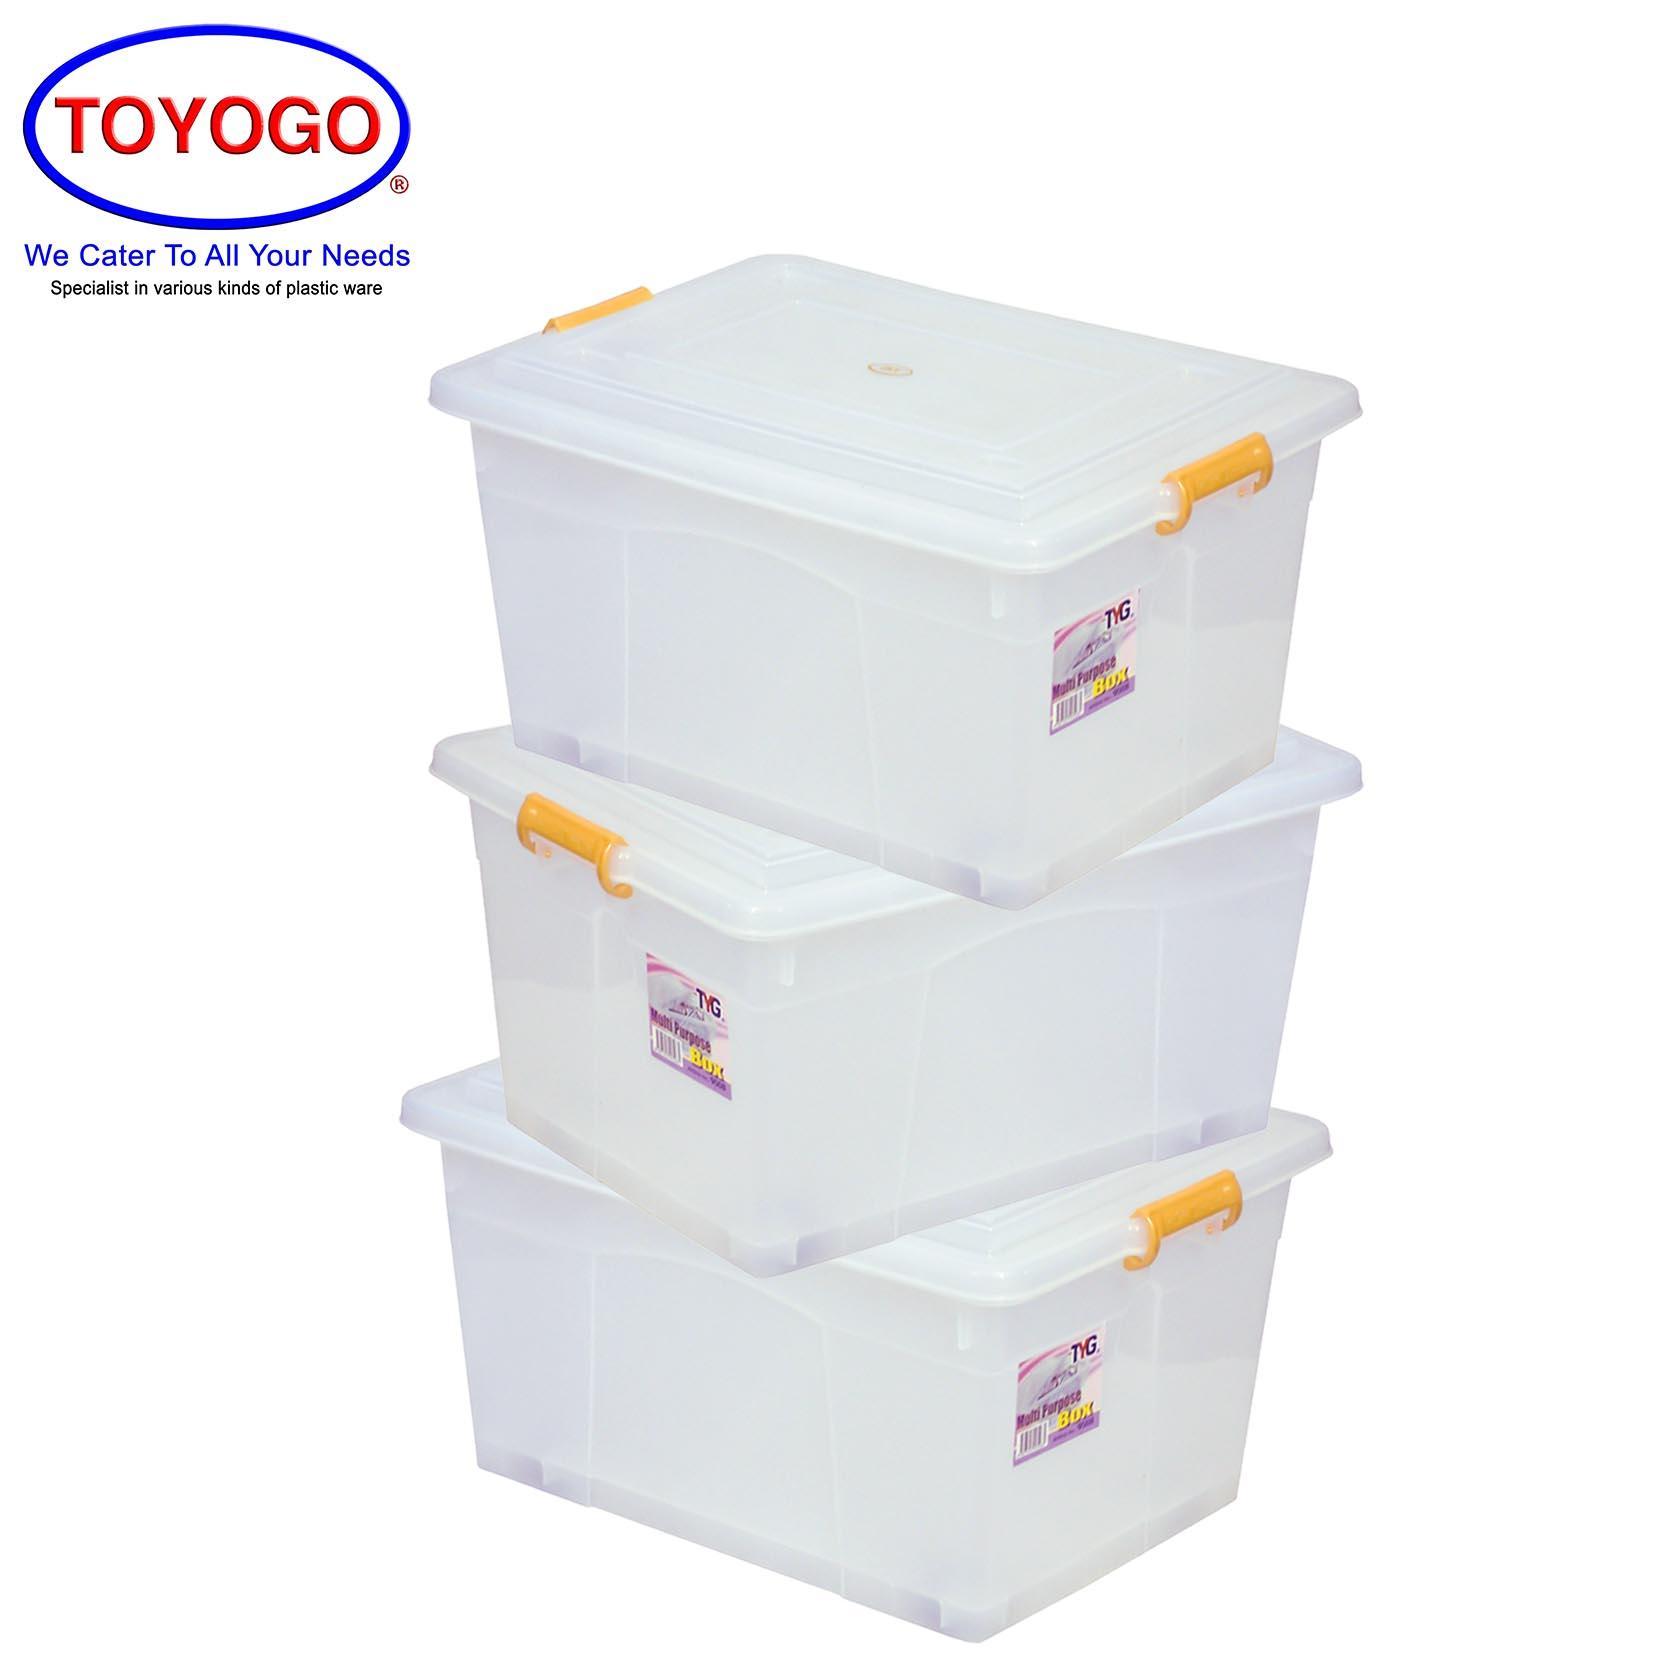 Toyogo Storage Box With Wheels (Bundle of 3) (9508)